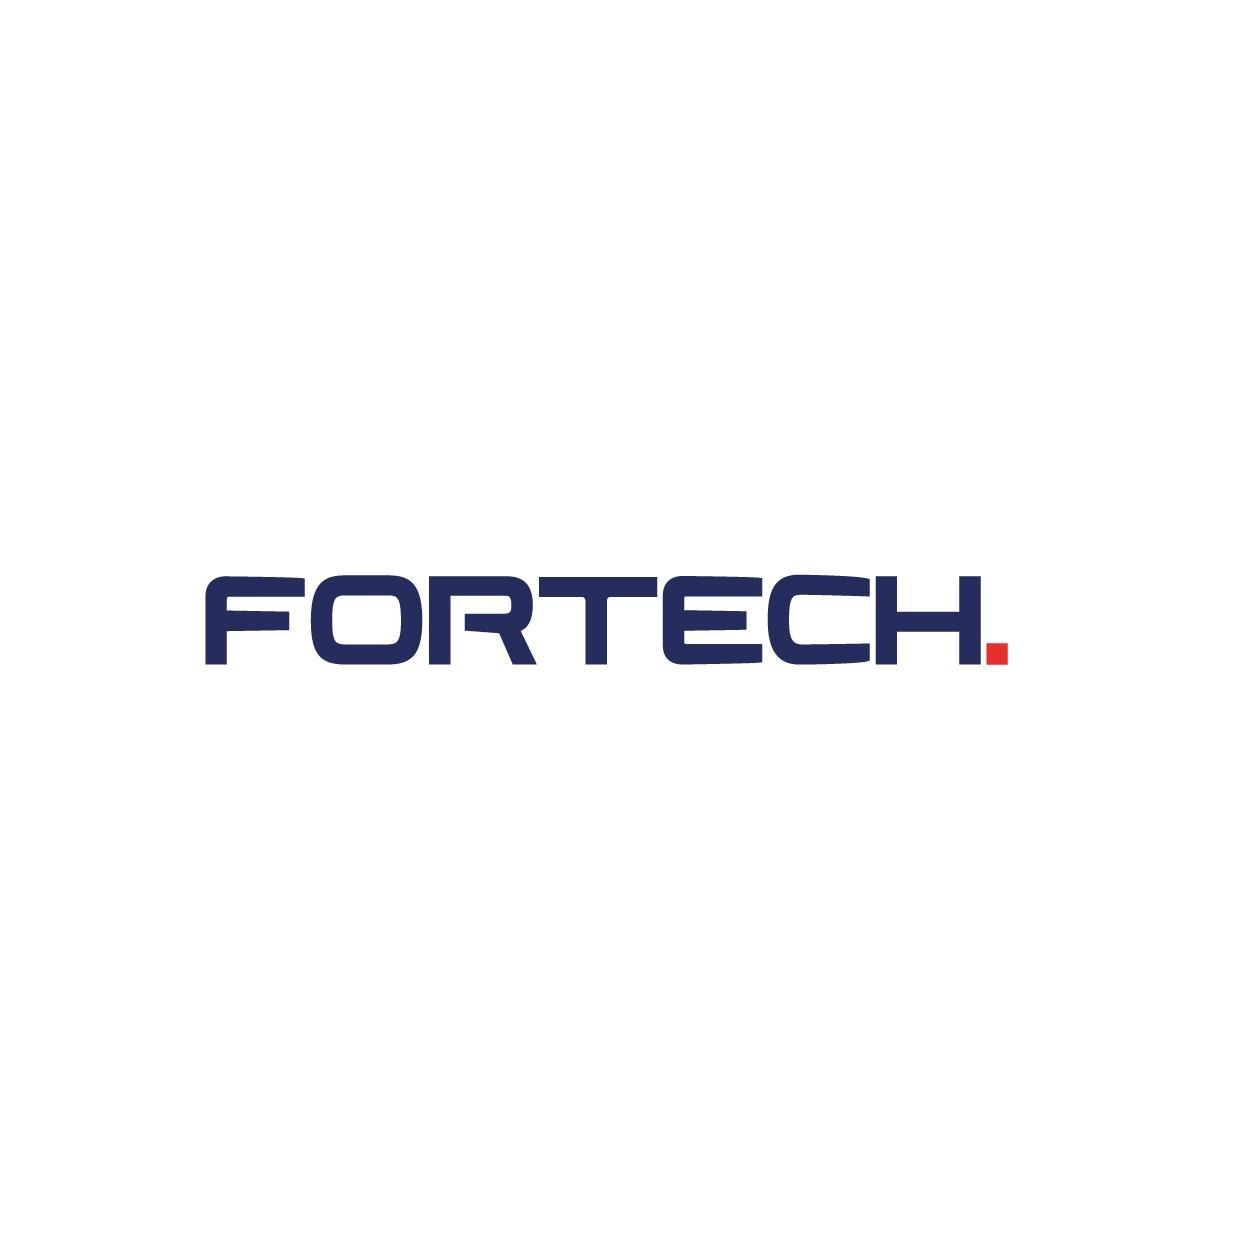 Fortech Logo